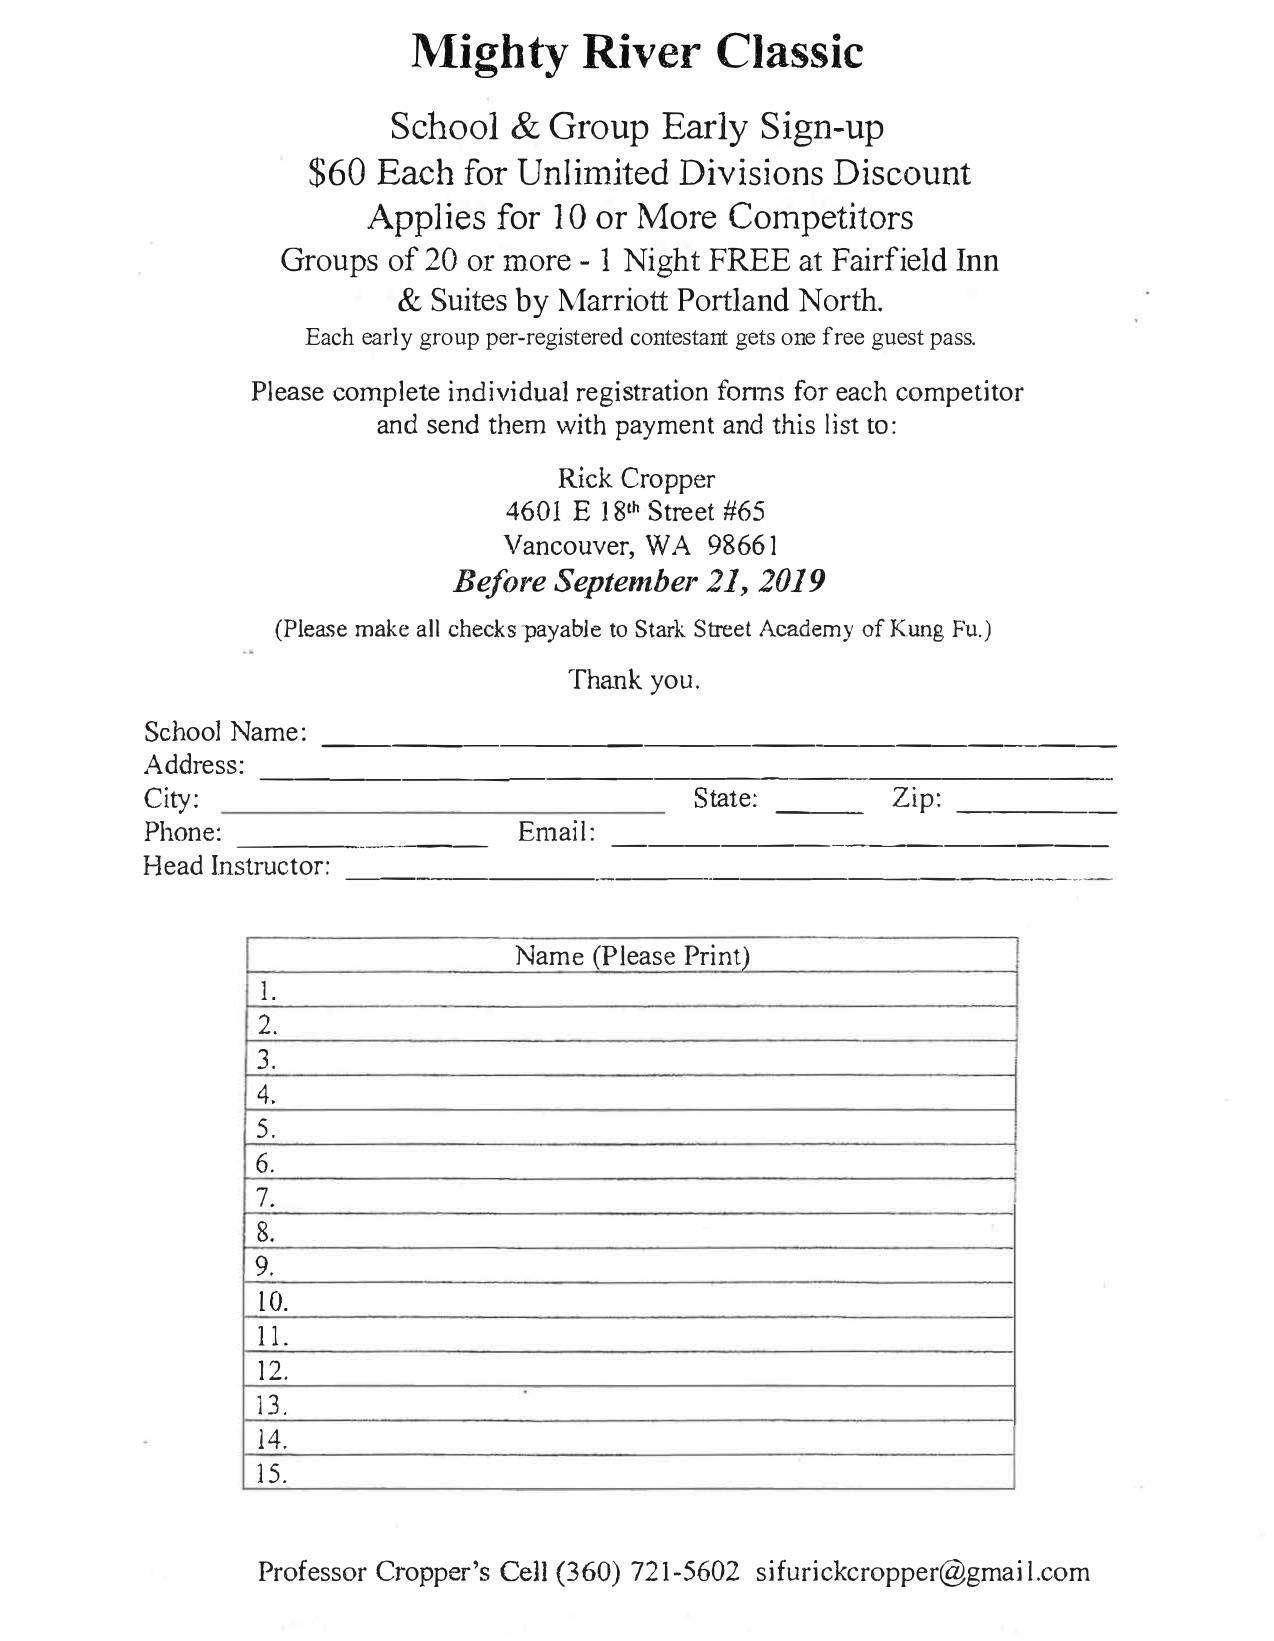 School & Early Group Sign-up Reg. 2019C.jpg